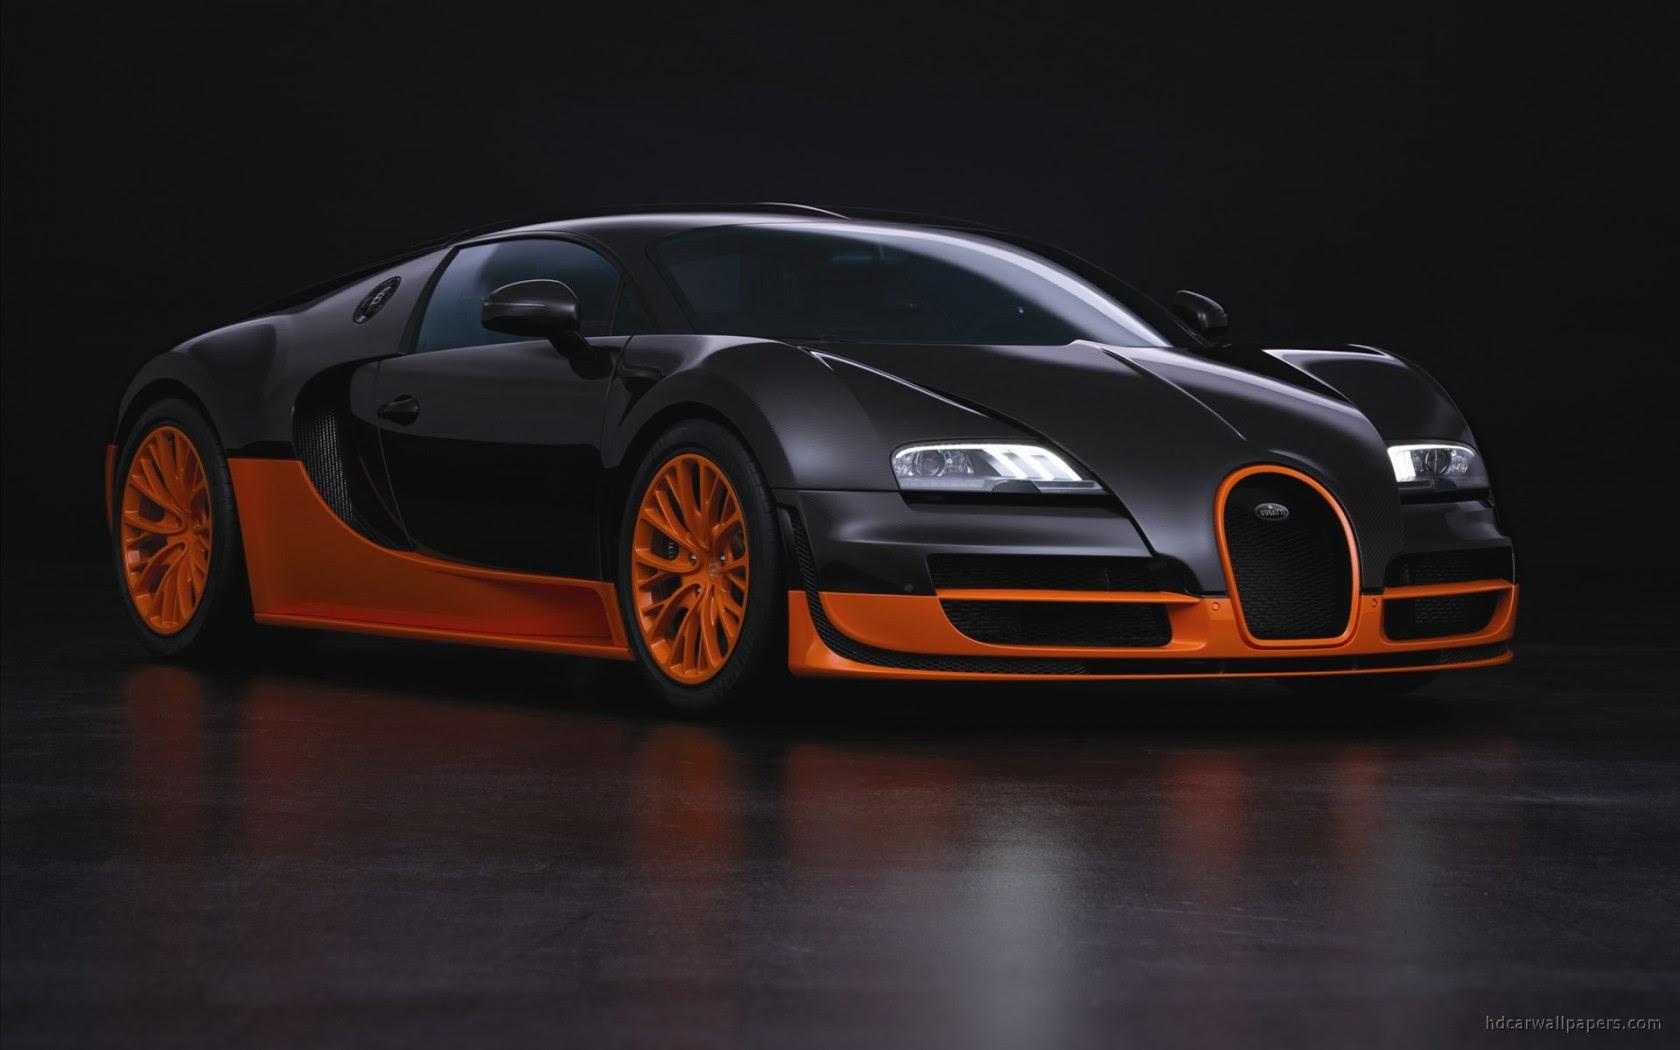 Bugatti Veyron Super Sports Car Wallpaper in 1680x1050 Resolution